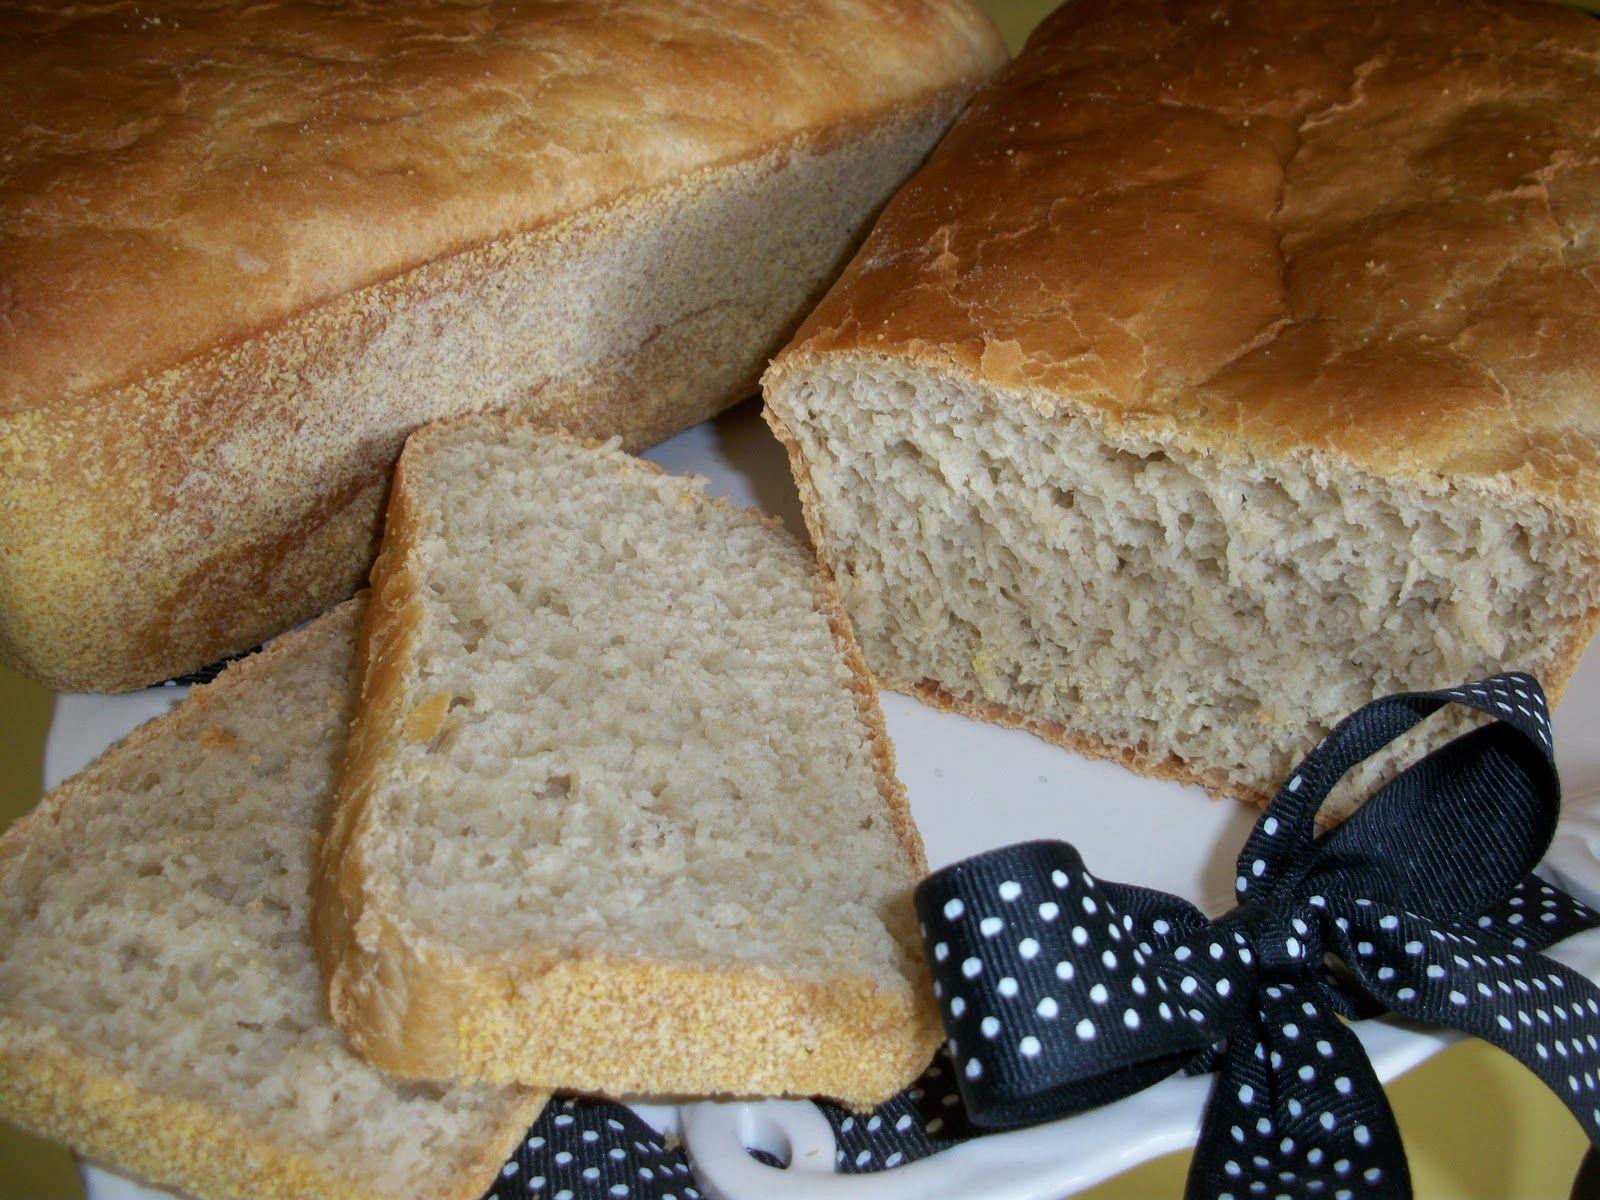 I think I'll make some bread